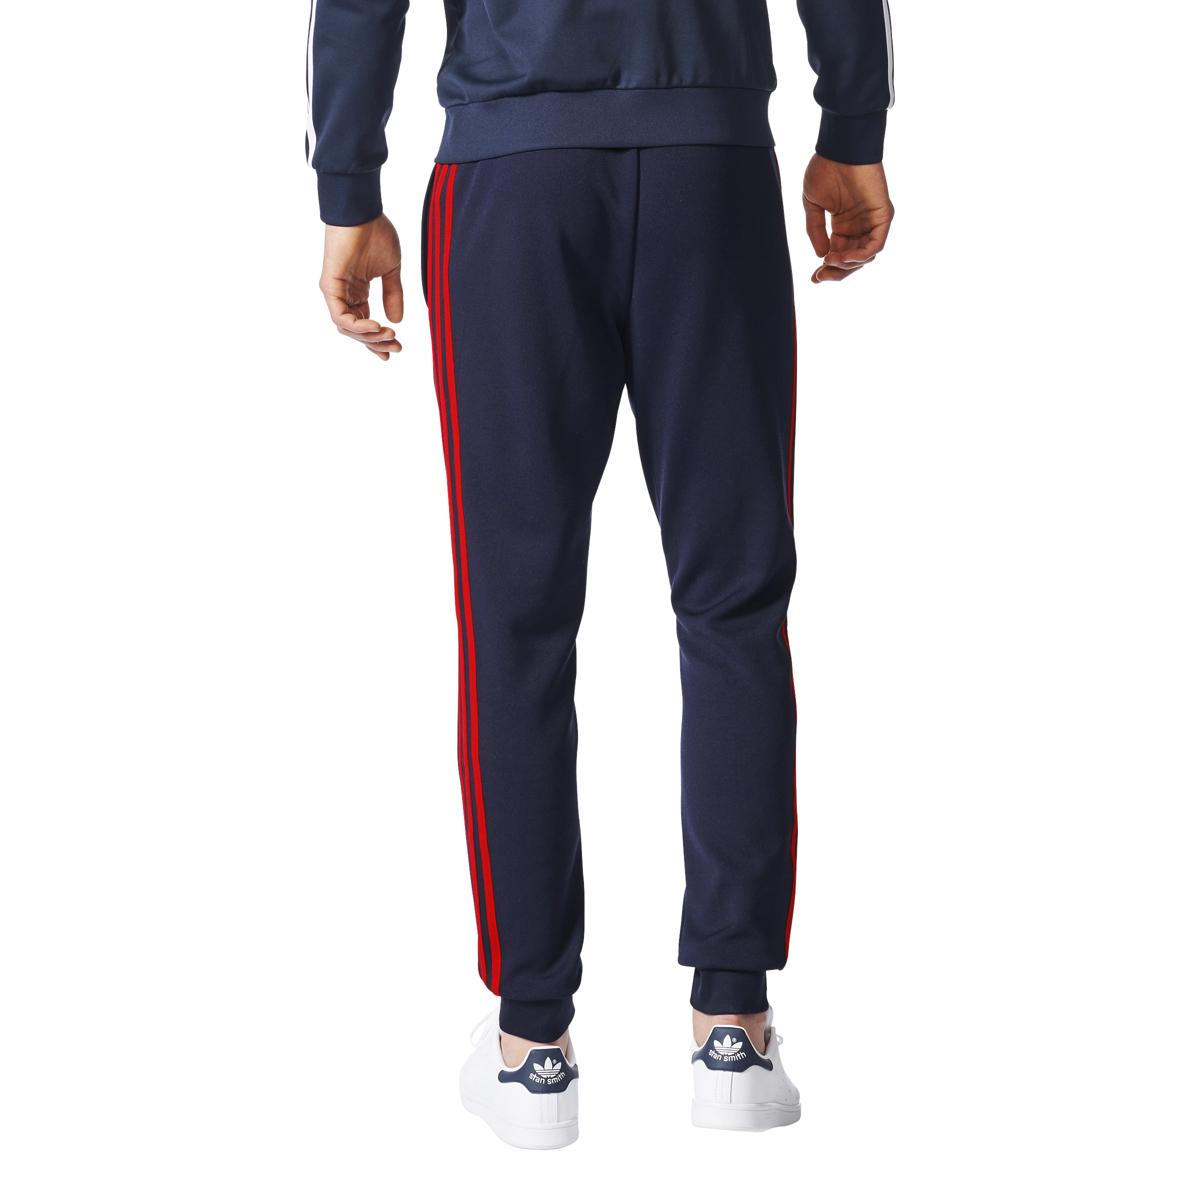 Details about Adidas Originals Superstar Men's Cuffed Track Pants Legend Ink Red br4288